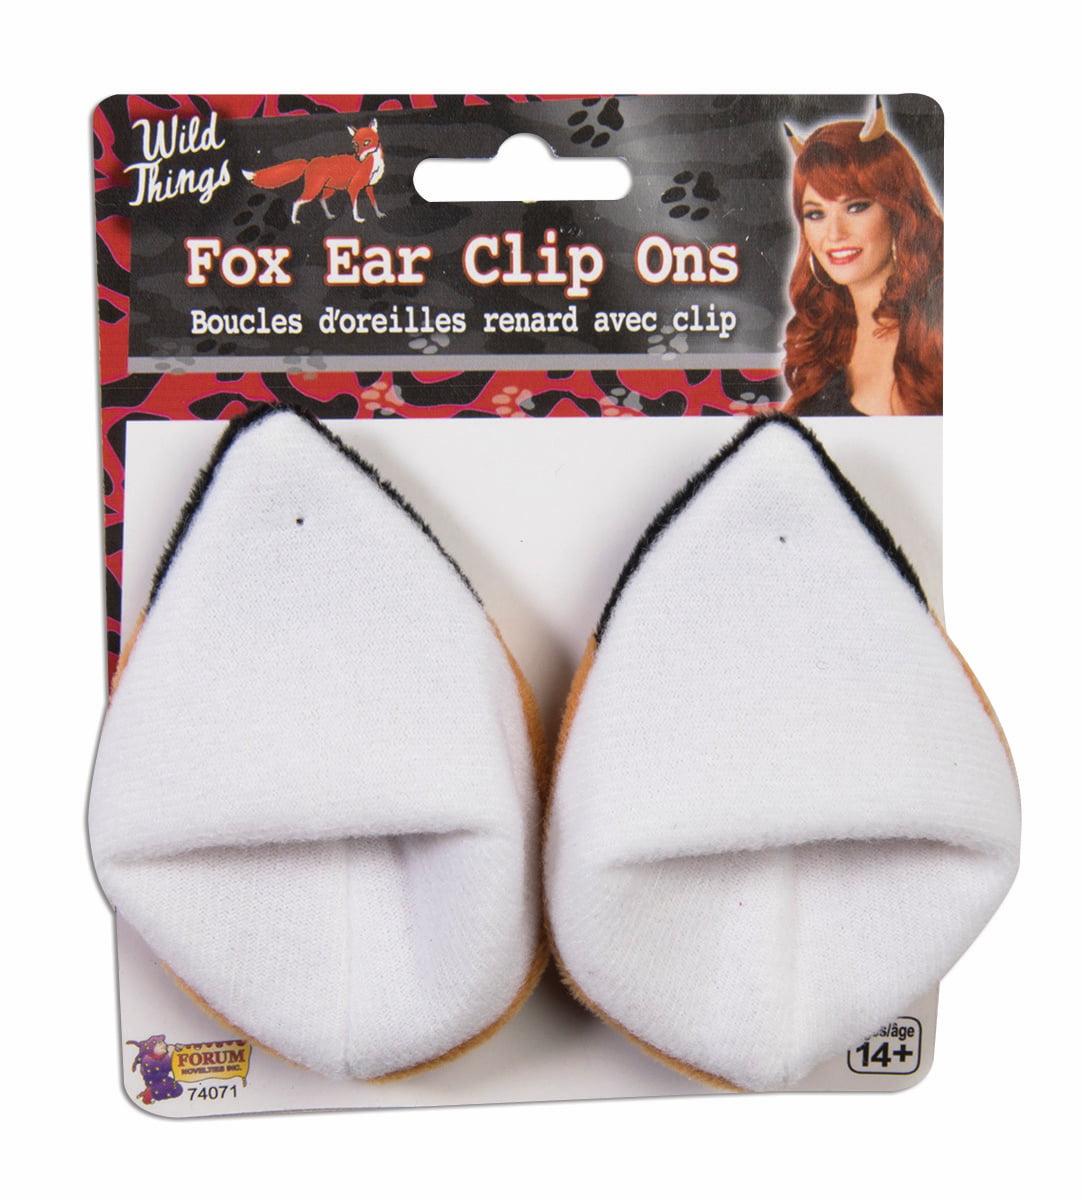 Fox Ears Hair Clips Faux Fur Costume Accessory Adult Child Girls Headpiece